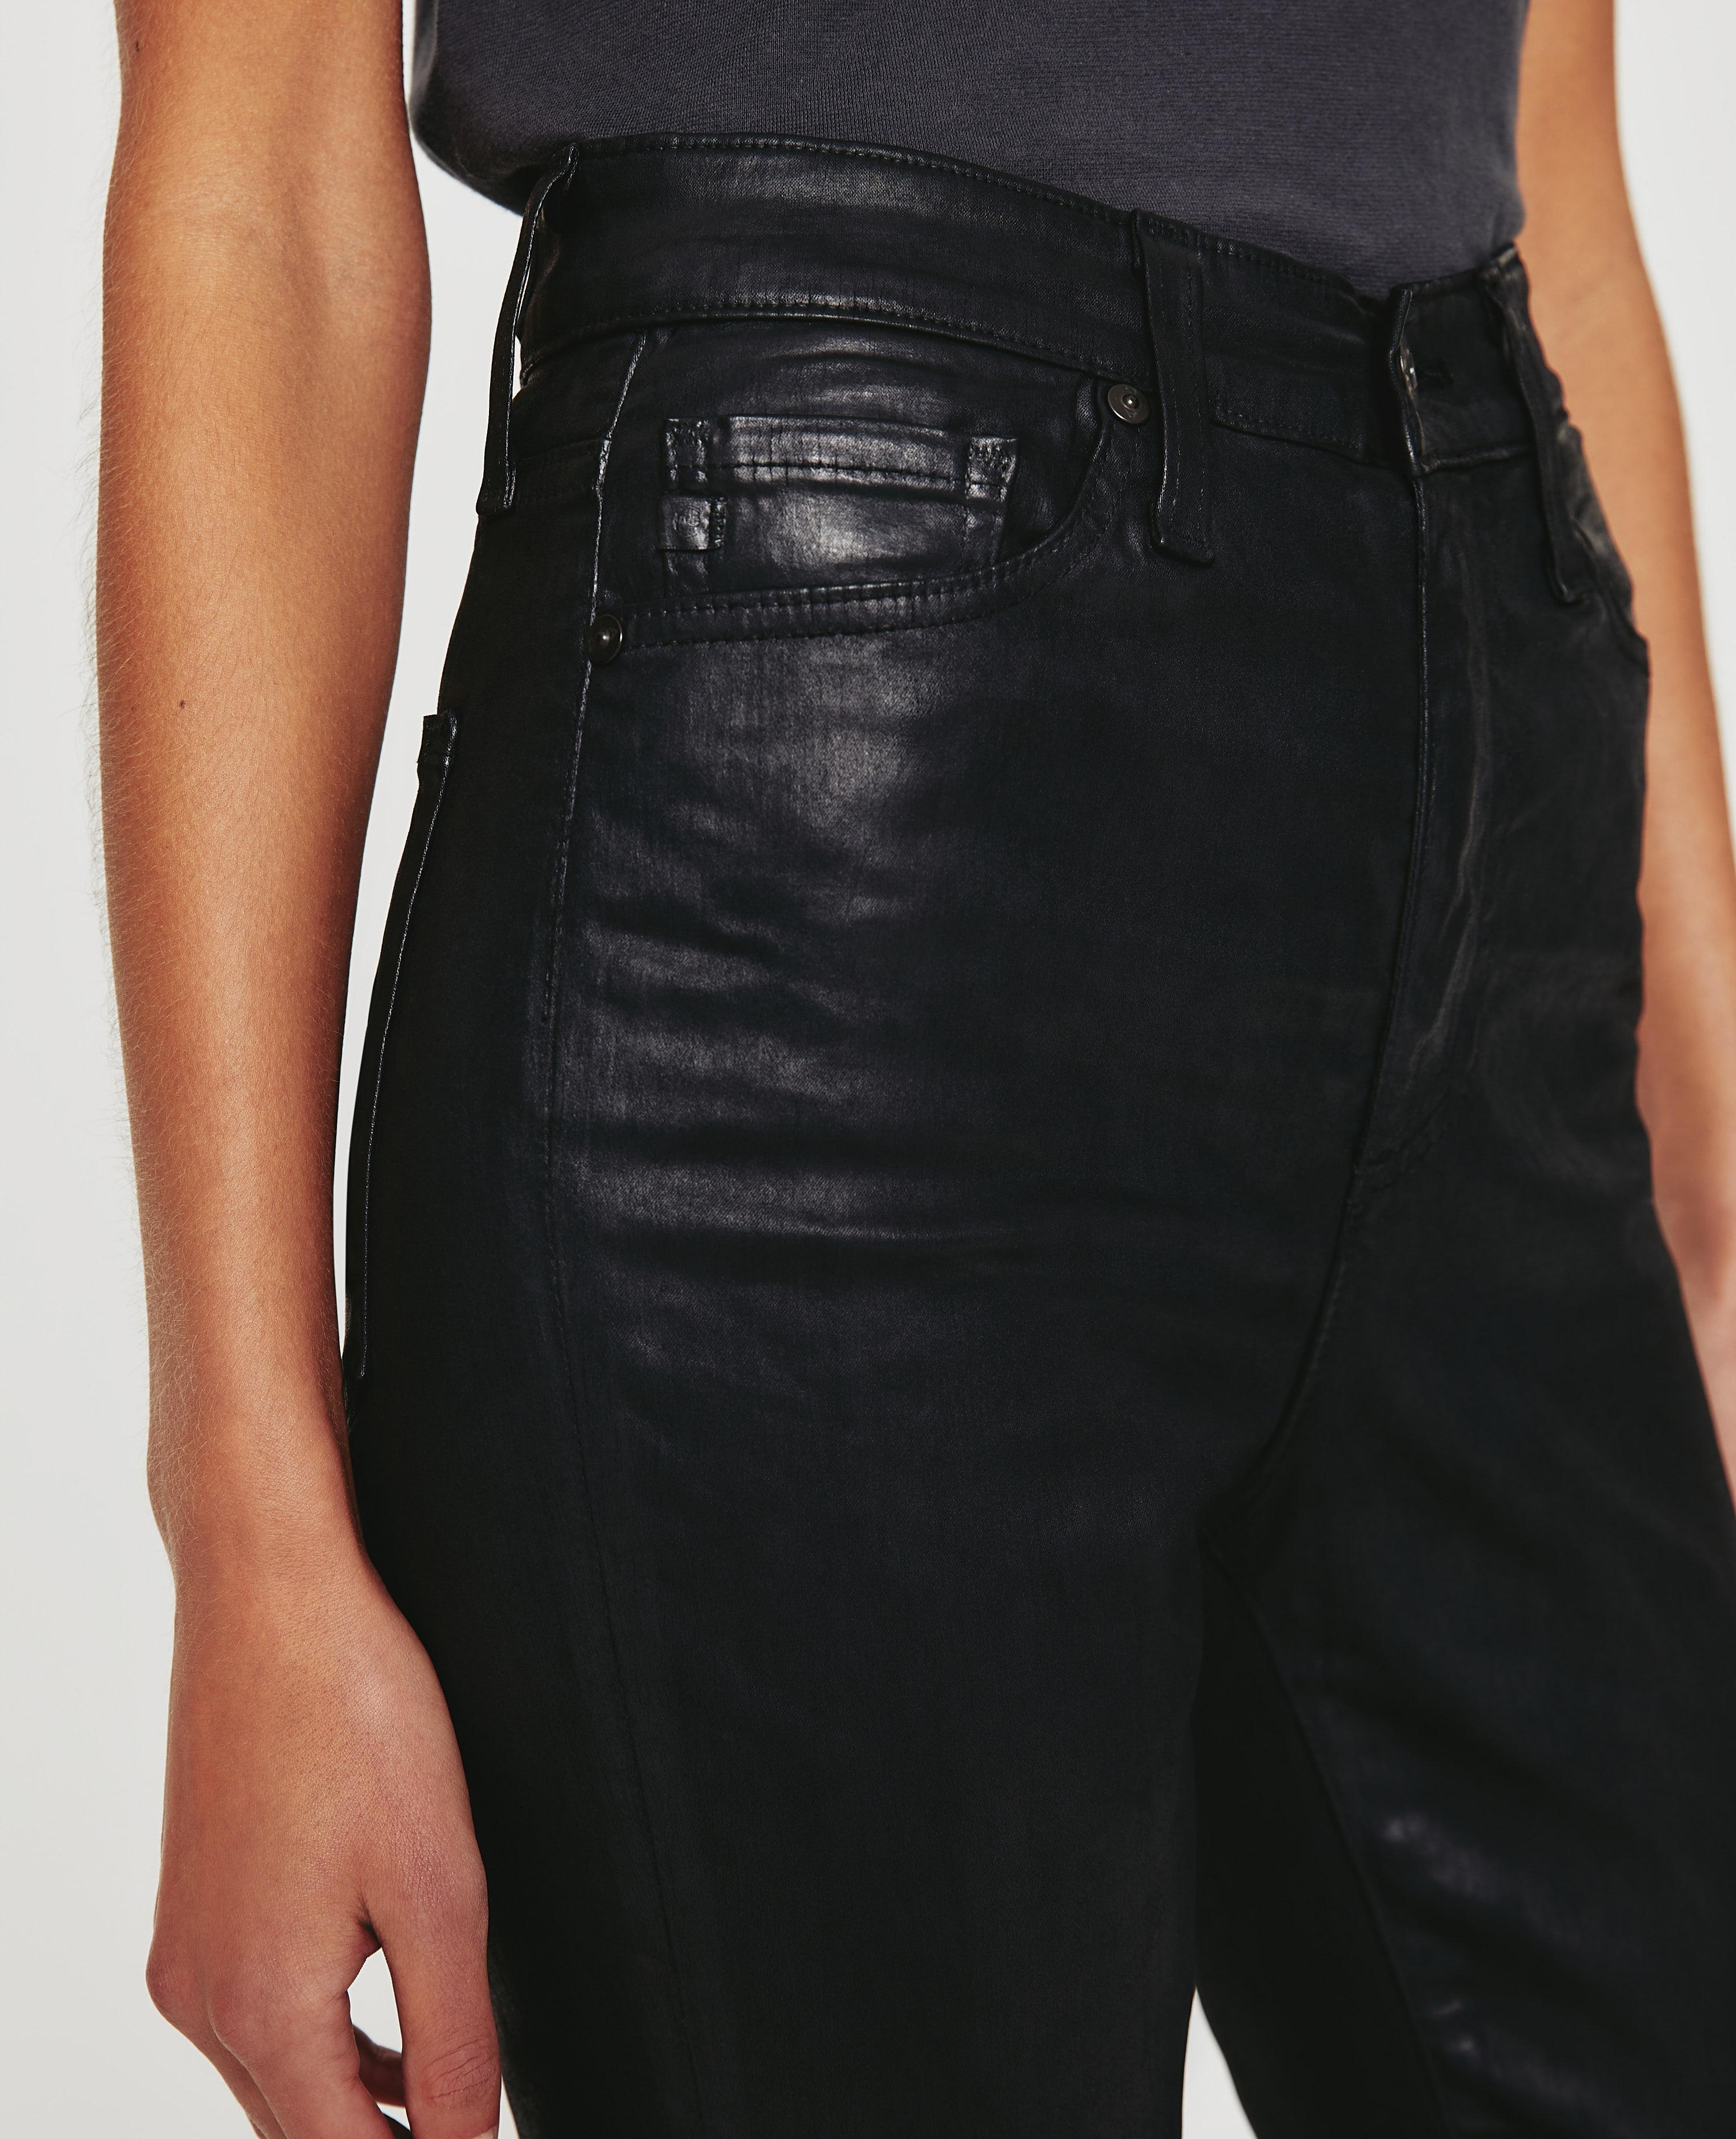 The Leatherette Mila